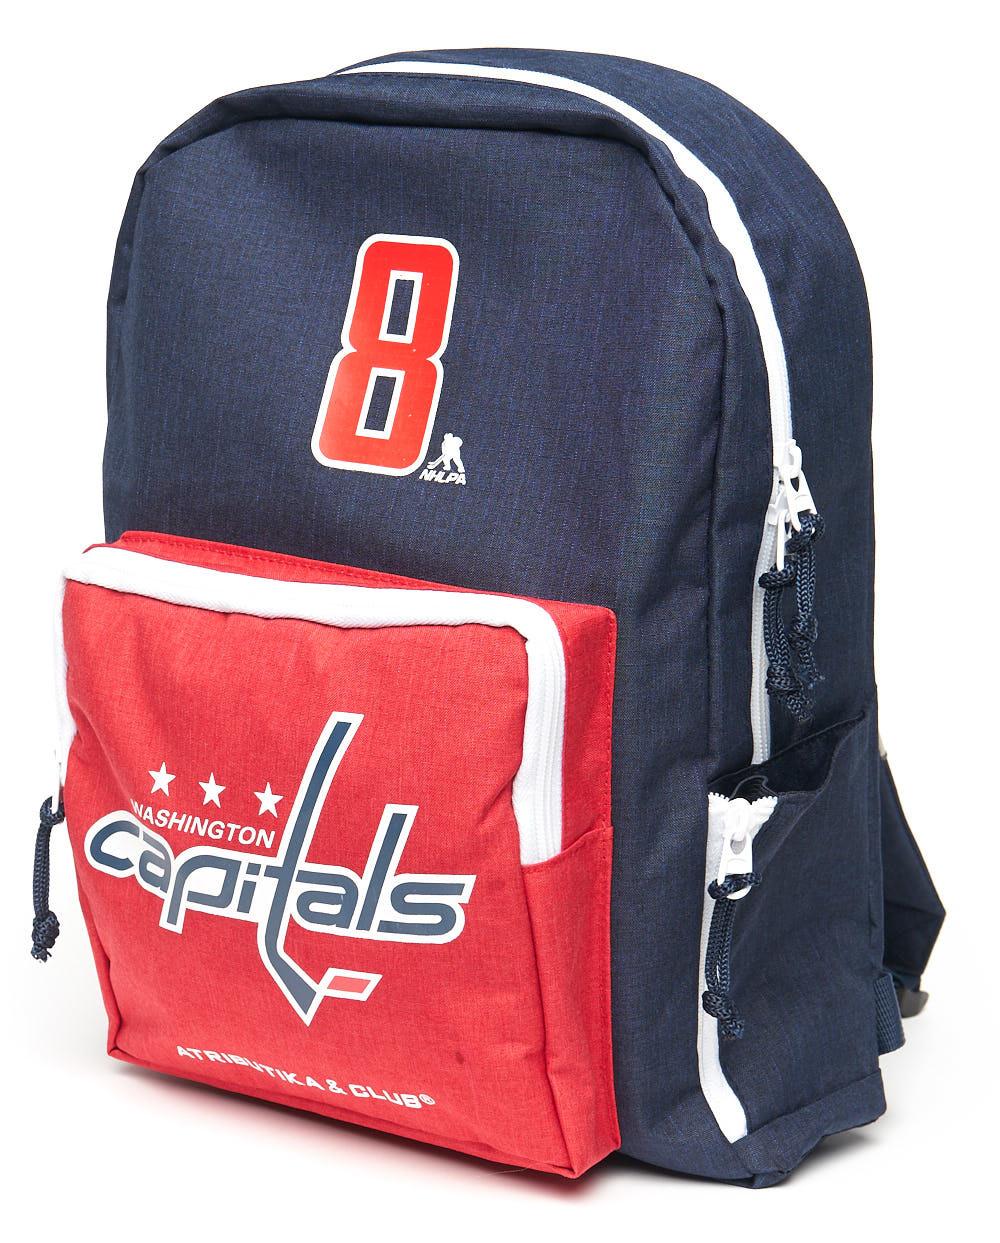 Рюкзак NHL Washington Capitals № 8 (детский)